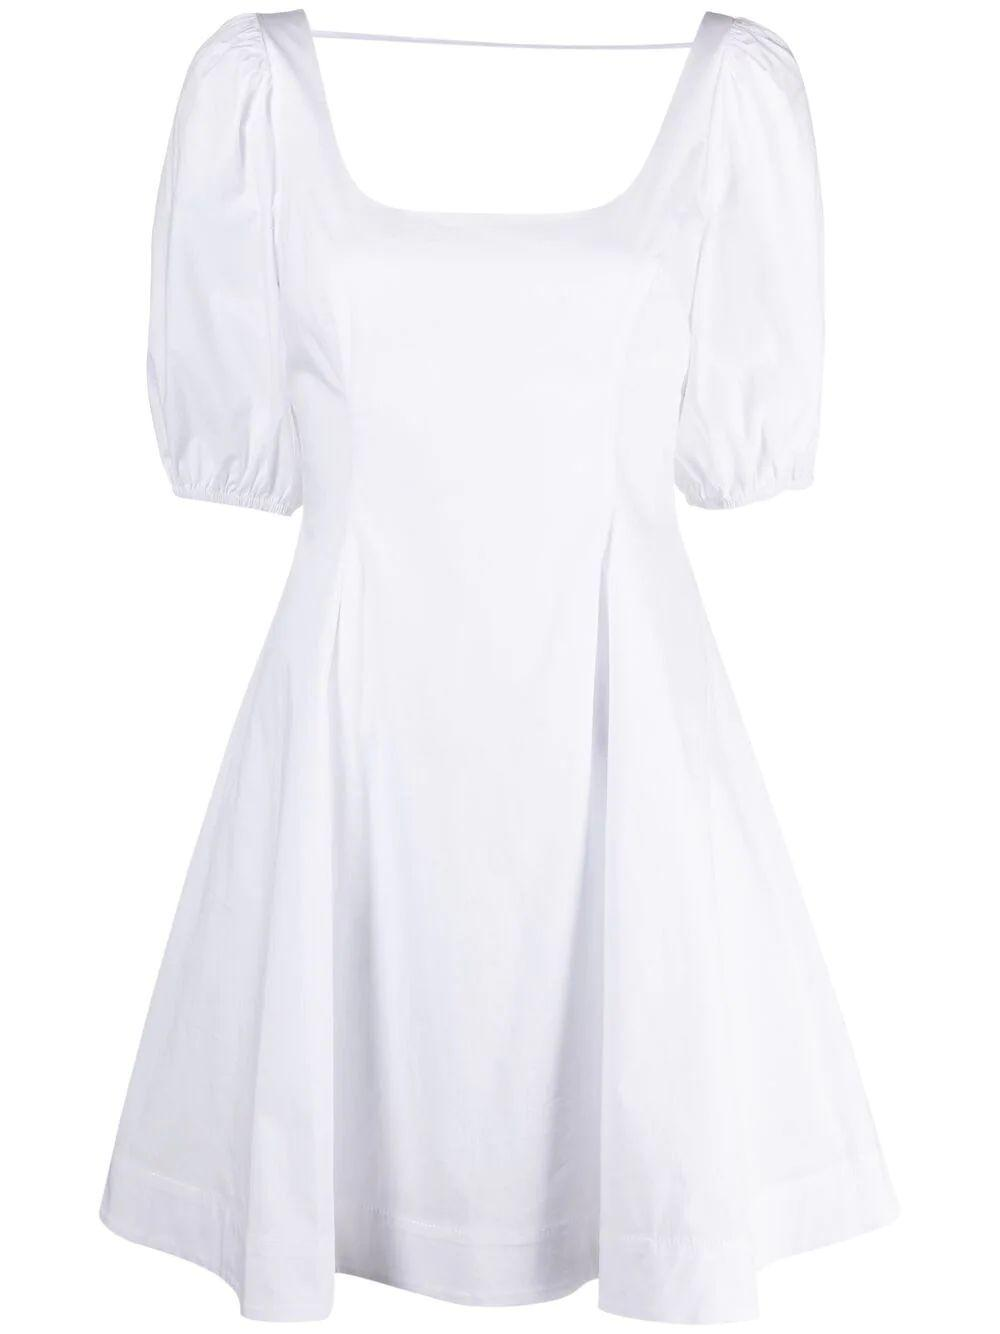 Leila Dress Item # 90-7324